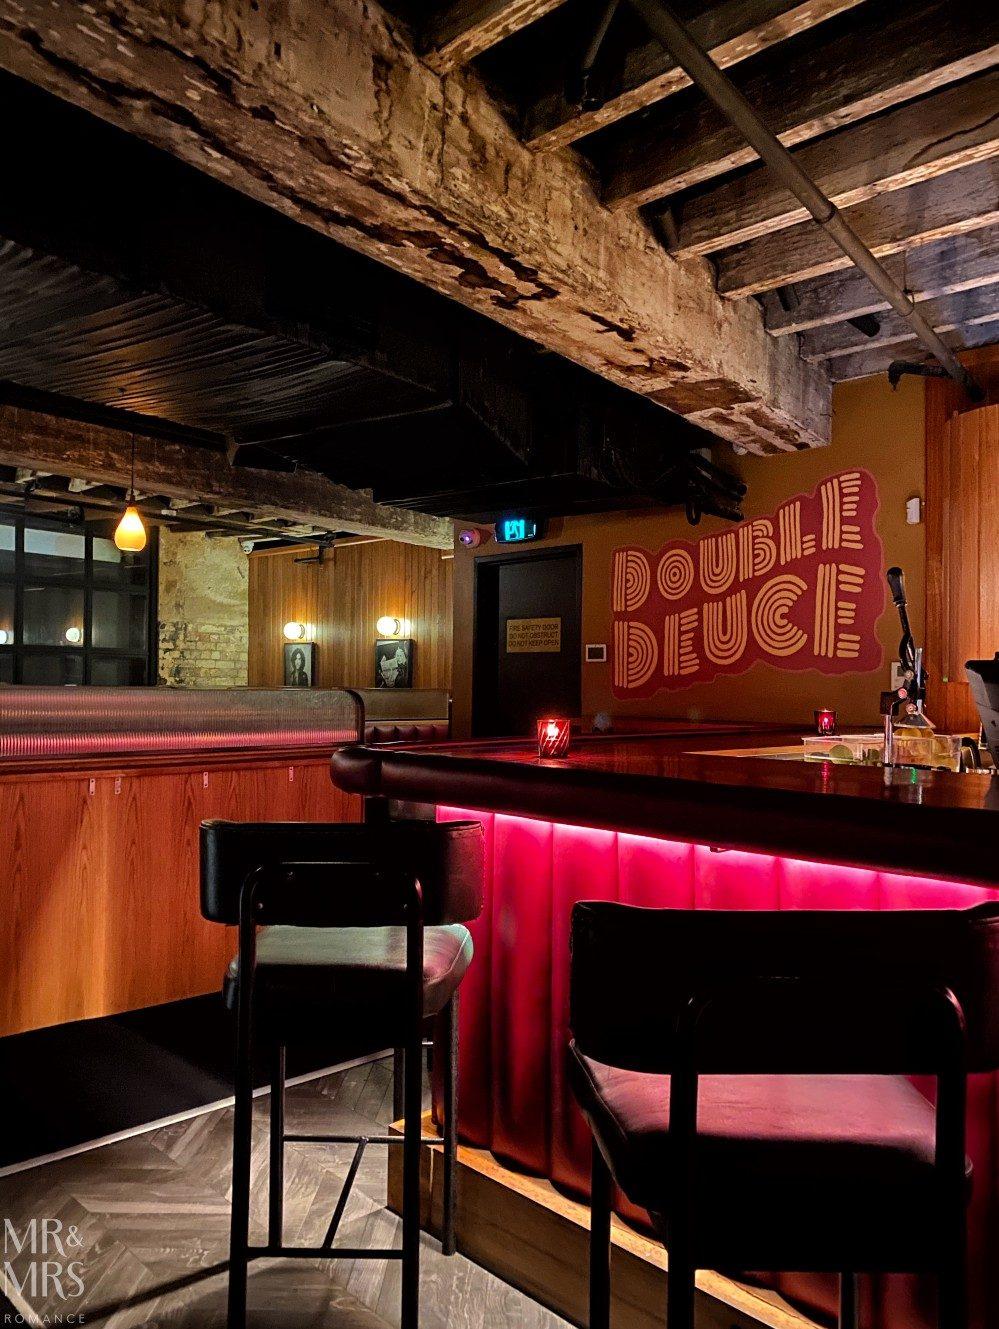 Double Deuce Lounge, Sydney